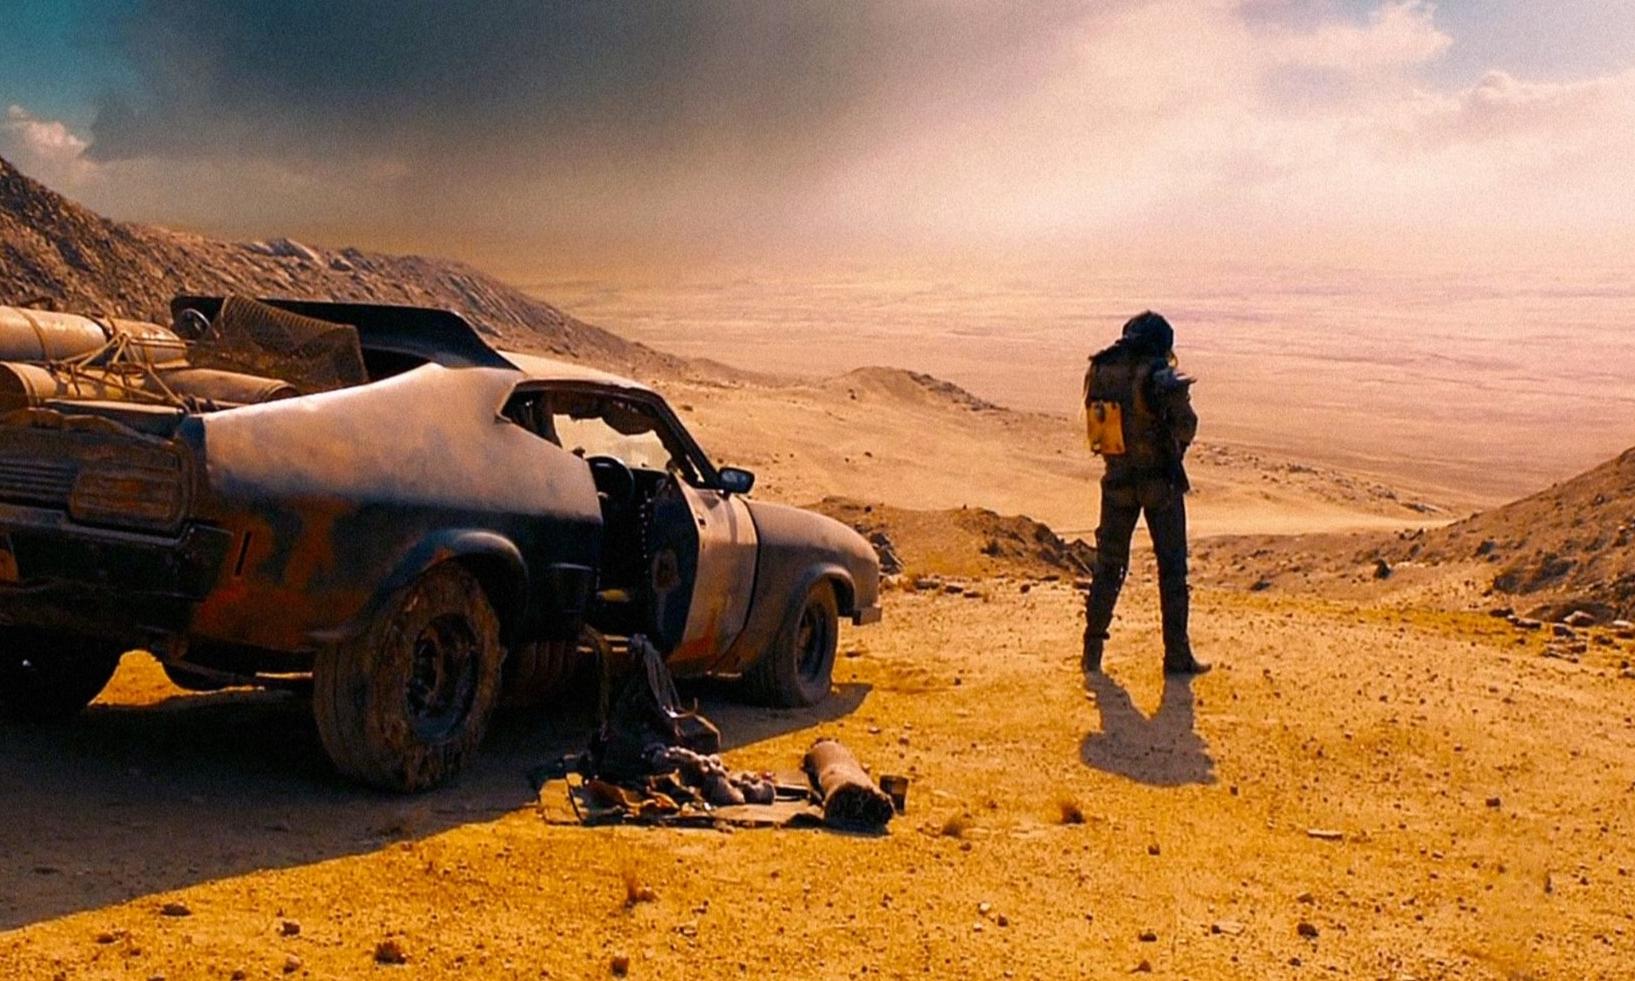 Mad Max: Fury Road (2015) - Directed by: George MillerWritten by: George Miller, Brendan McCarthy & Nick Lathouris